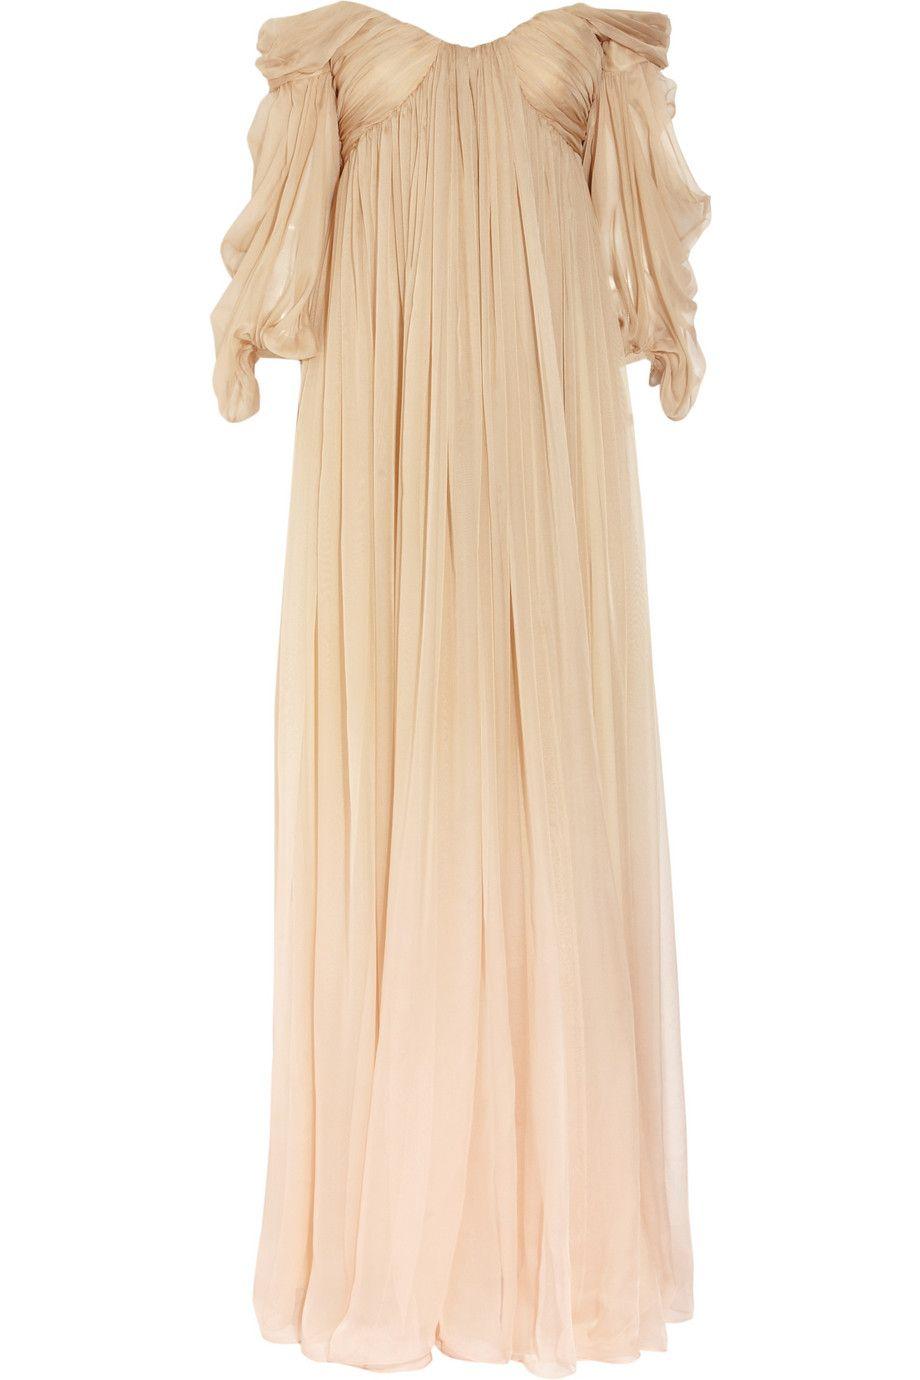 Alexander Mcqueen Degradé Silk Chiffon Gown in Beige   Lyst ; $2477